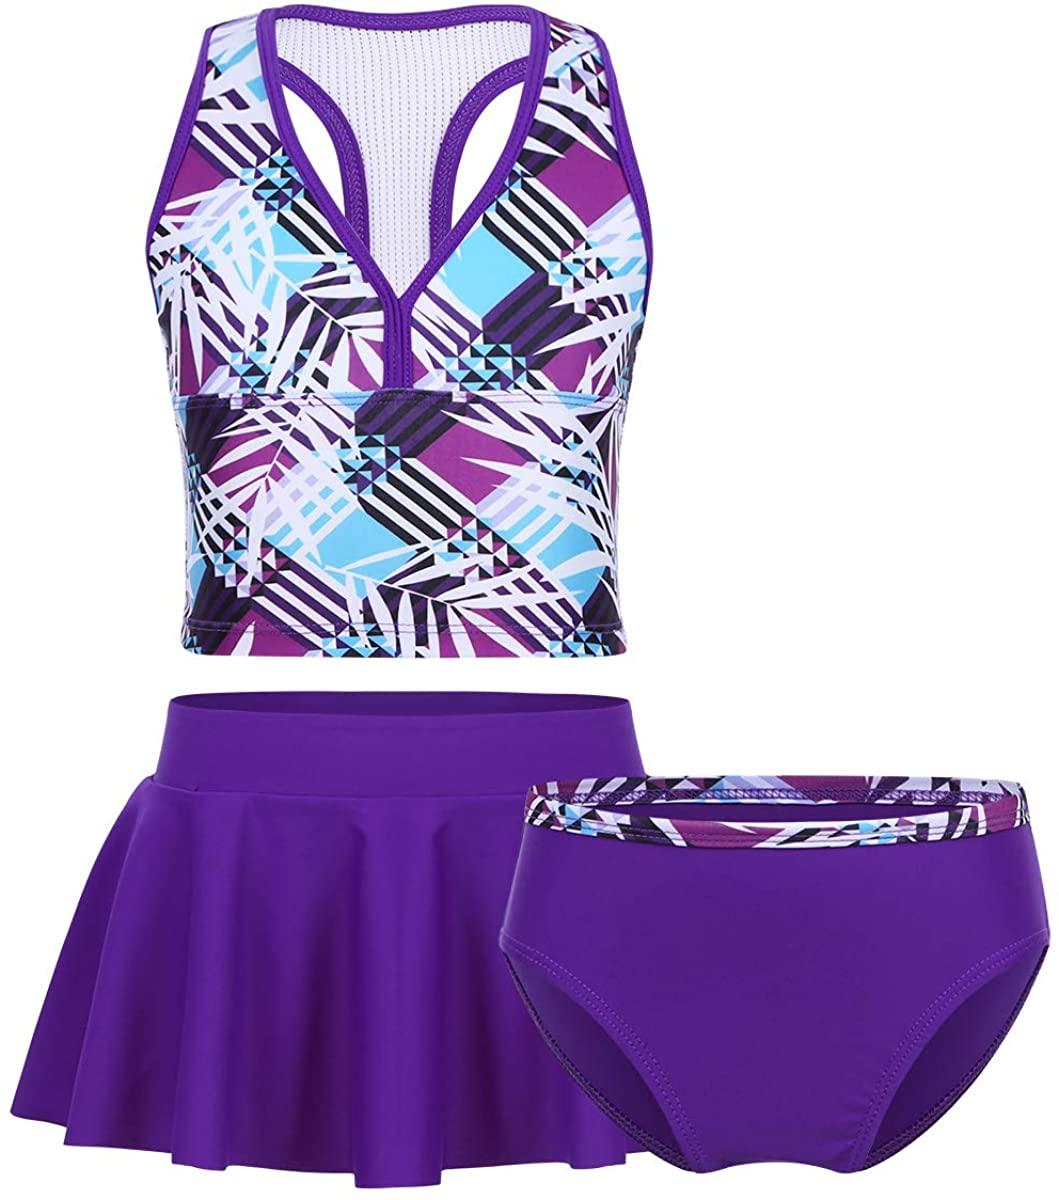 JEATHA Kids Girls 3PCS Tankini Bikini Swimsuit Digital Printed Sports Racer Back Top with Bottom Skirt Sets Swimwear